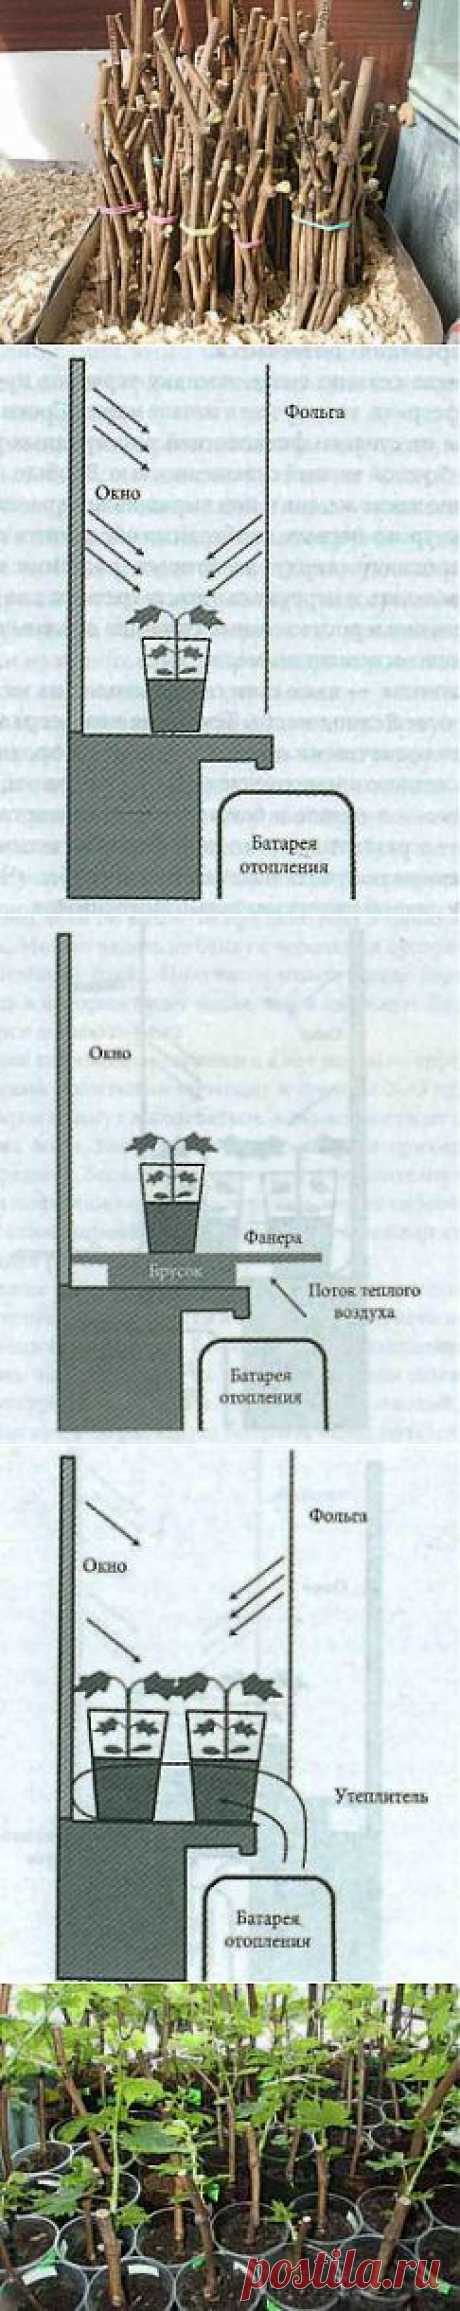 Подробно о выращивании черенков винограда в домашних условиях | Дача - впрок